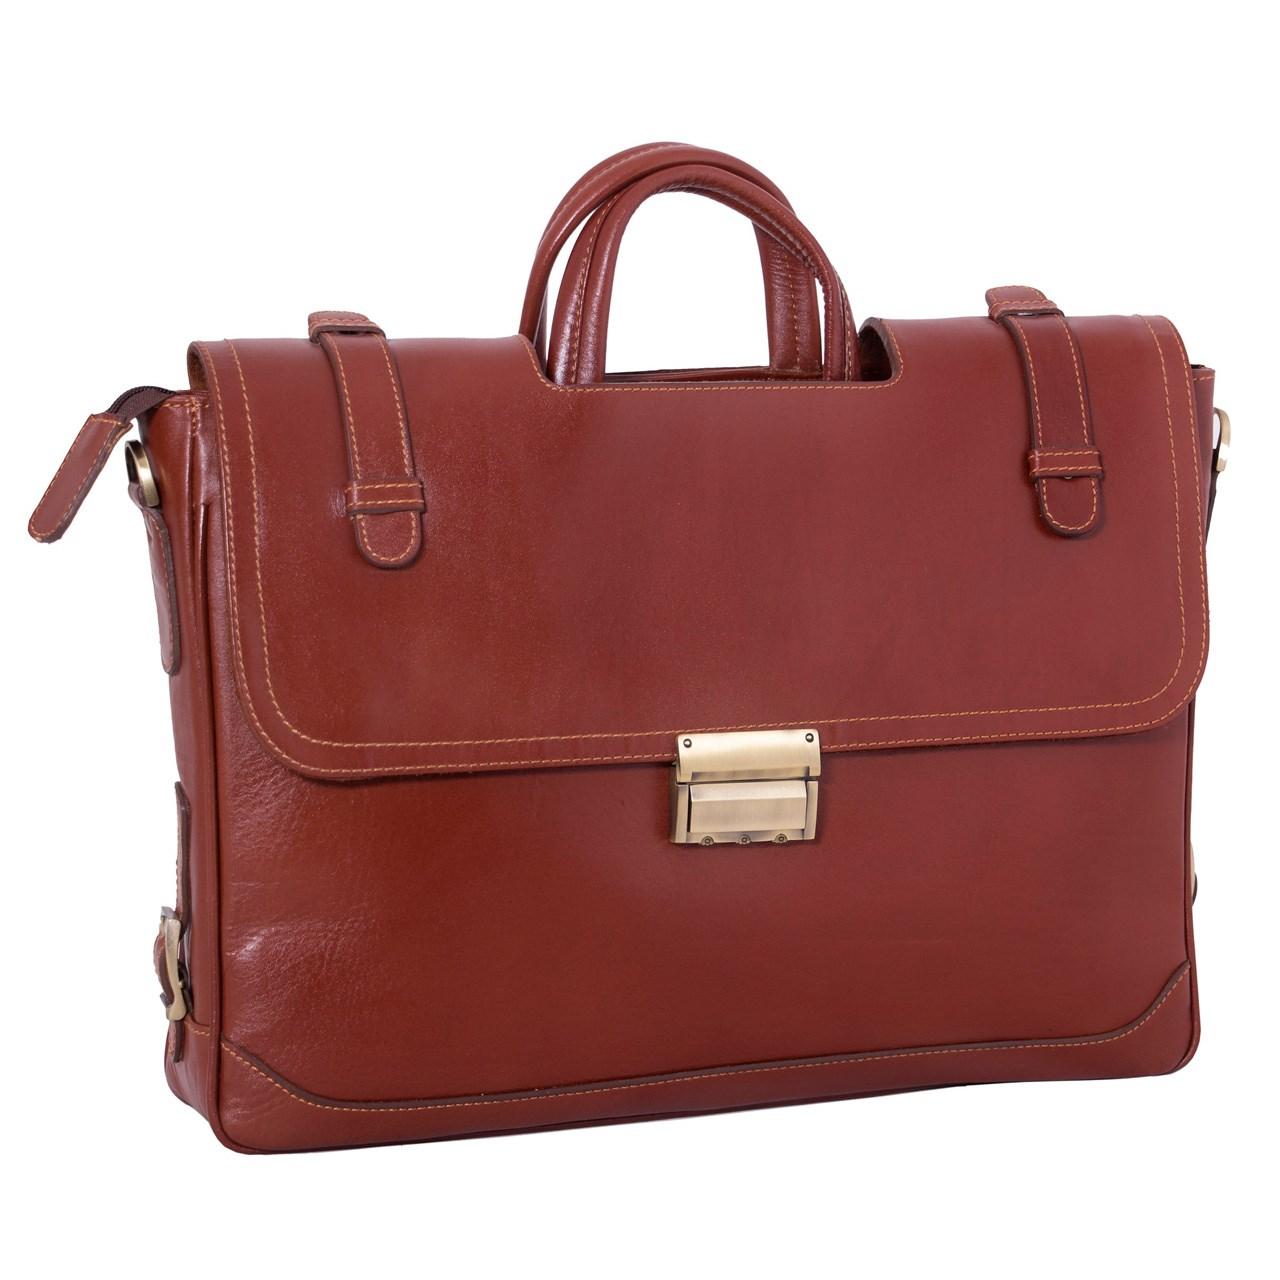 کیف اداری چرم طبیعی آدین چرم  مدل DL19